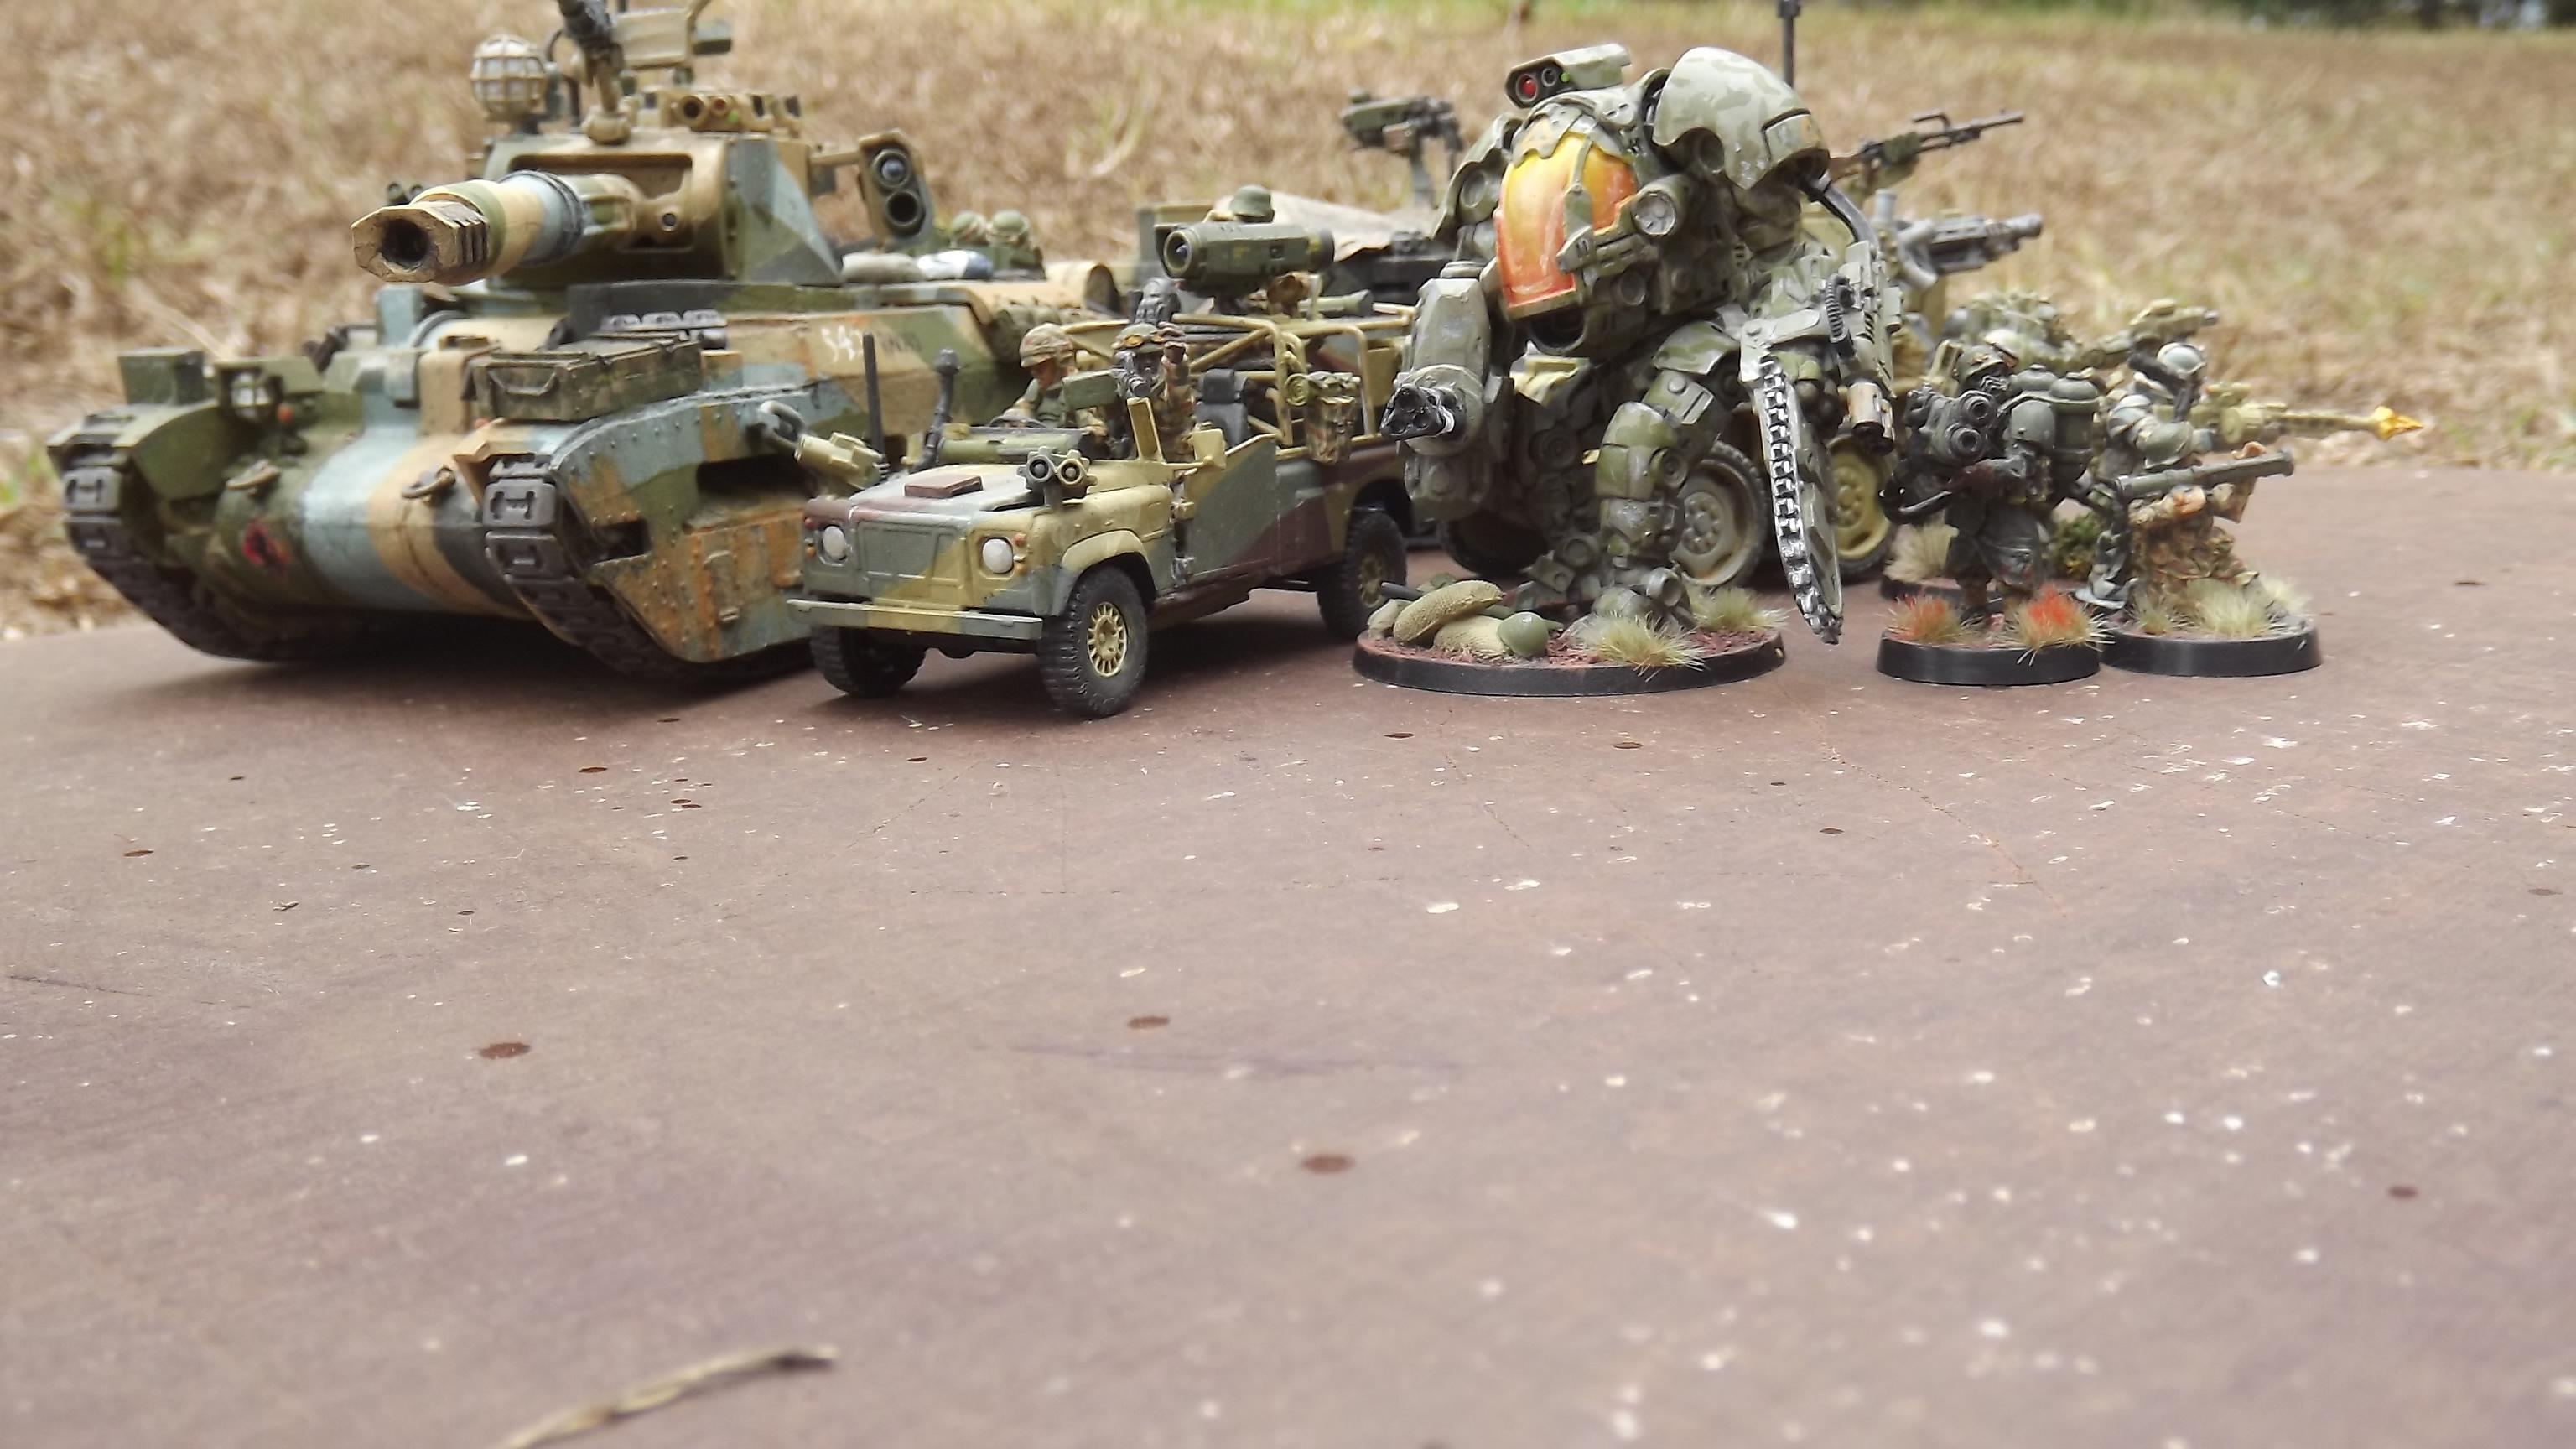 Assault Mech, Grenadier, Heavy Flamer, Landrover, Mantic Strider, Matilda, Mech, Recon, Rocket Launcher, Super-heavy, Tank, Victoria Miniatures